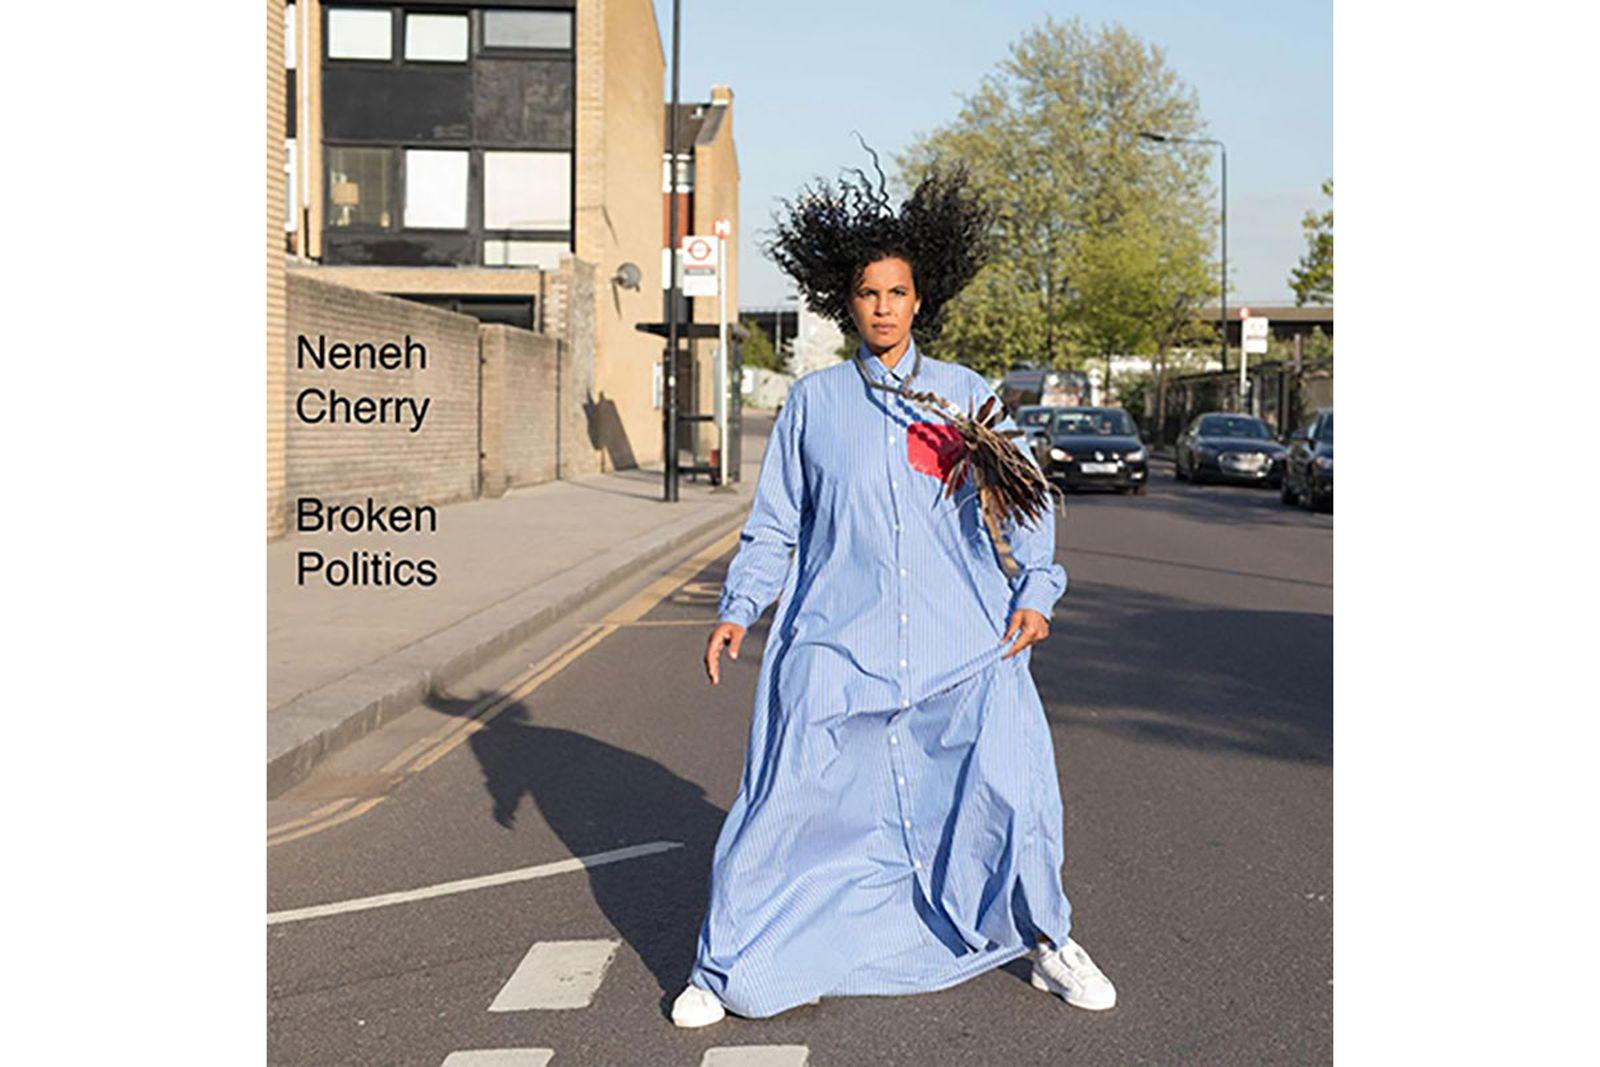 neneh cherry broken poltiics review Broken Politics nehneh cherry